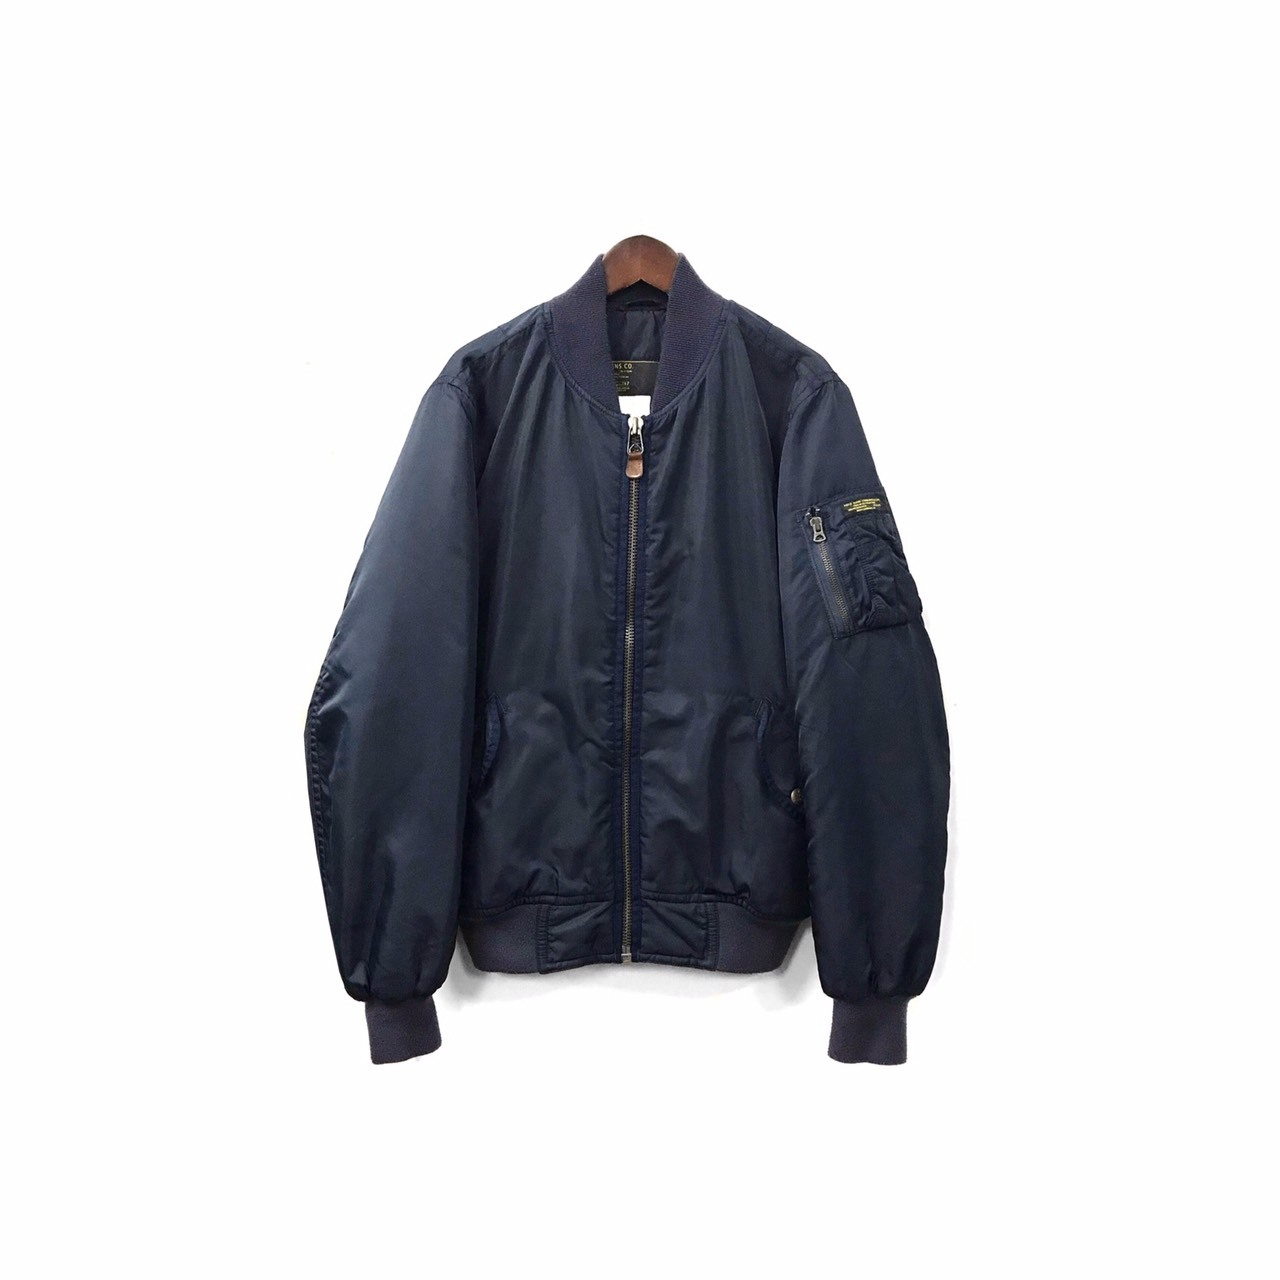 Polo Jeans - Nylon Flight Jacket (size - M) ¥16500+tax → ¥13200+tax